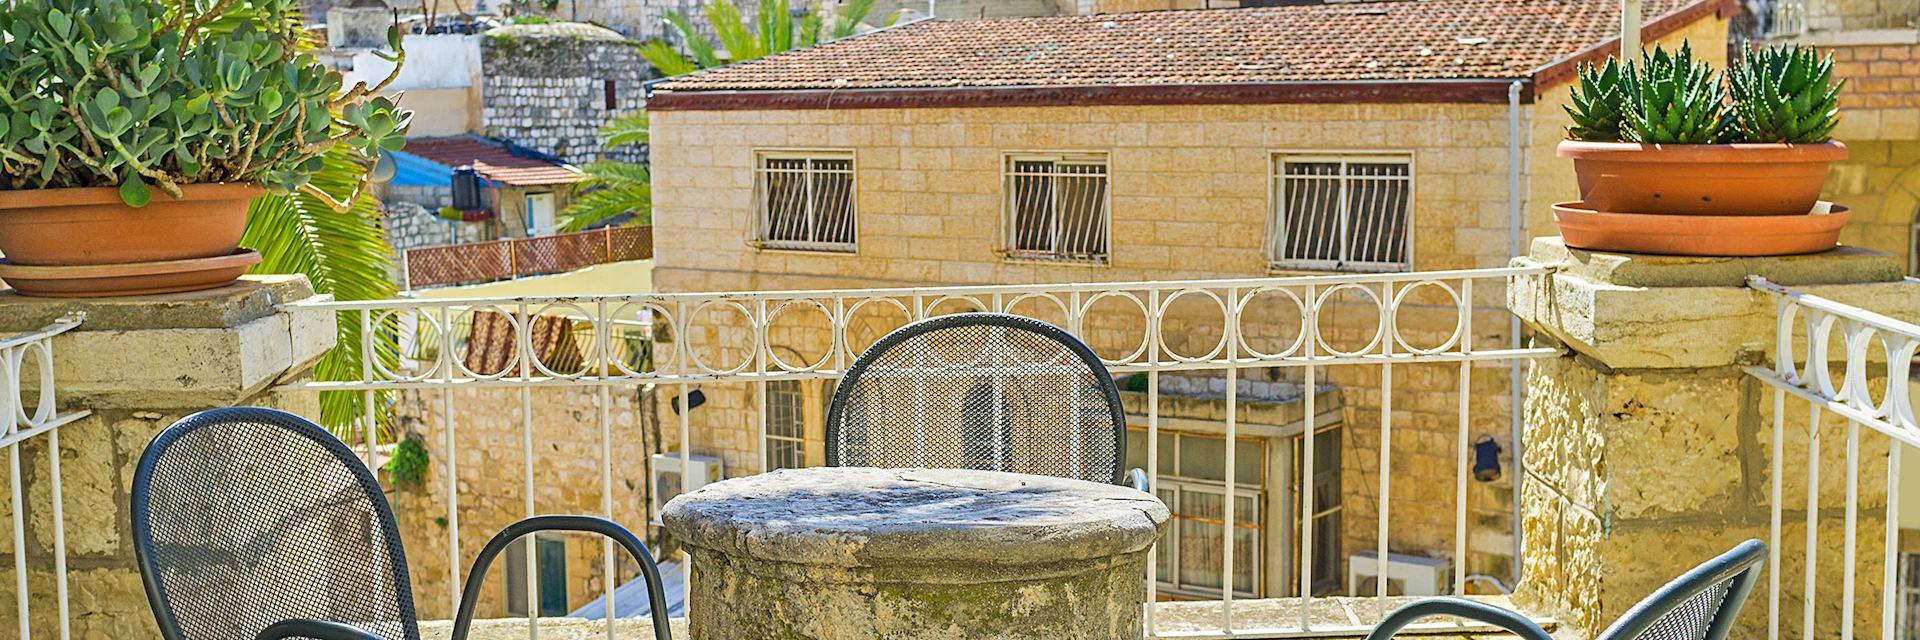 Terrace, Jerusalem